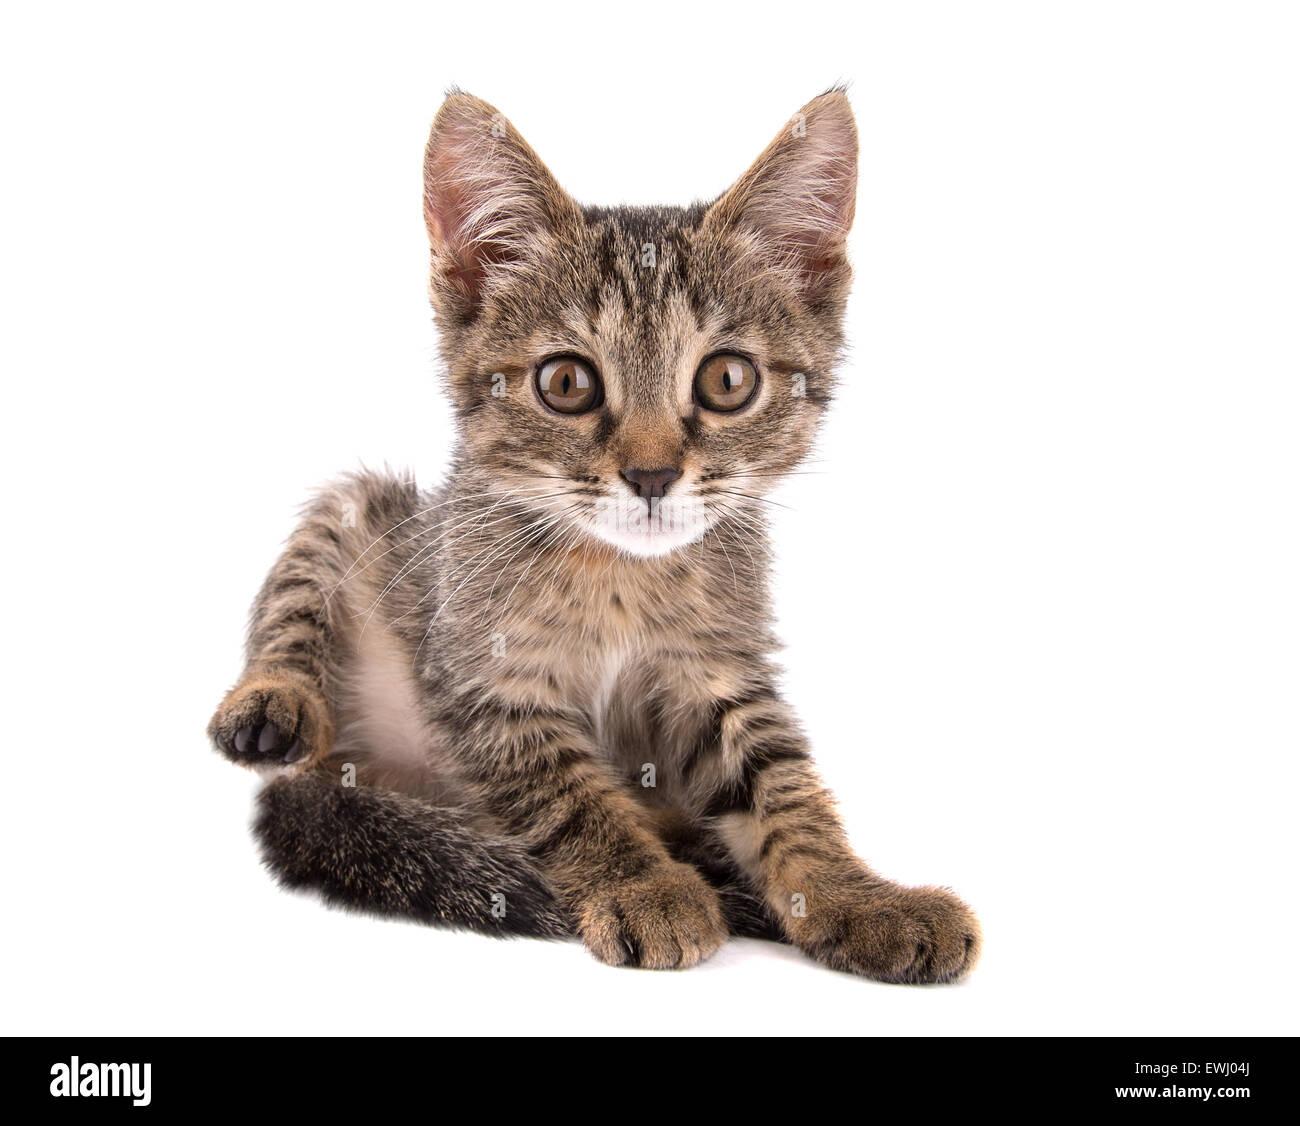 gray tabby kitten raising his hind leg looks into the camera on